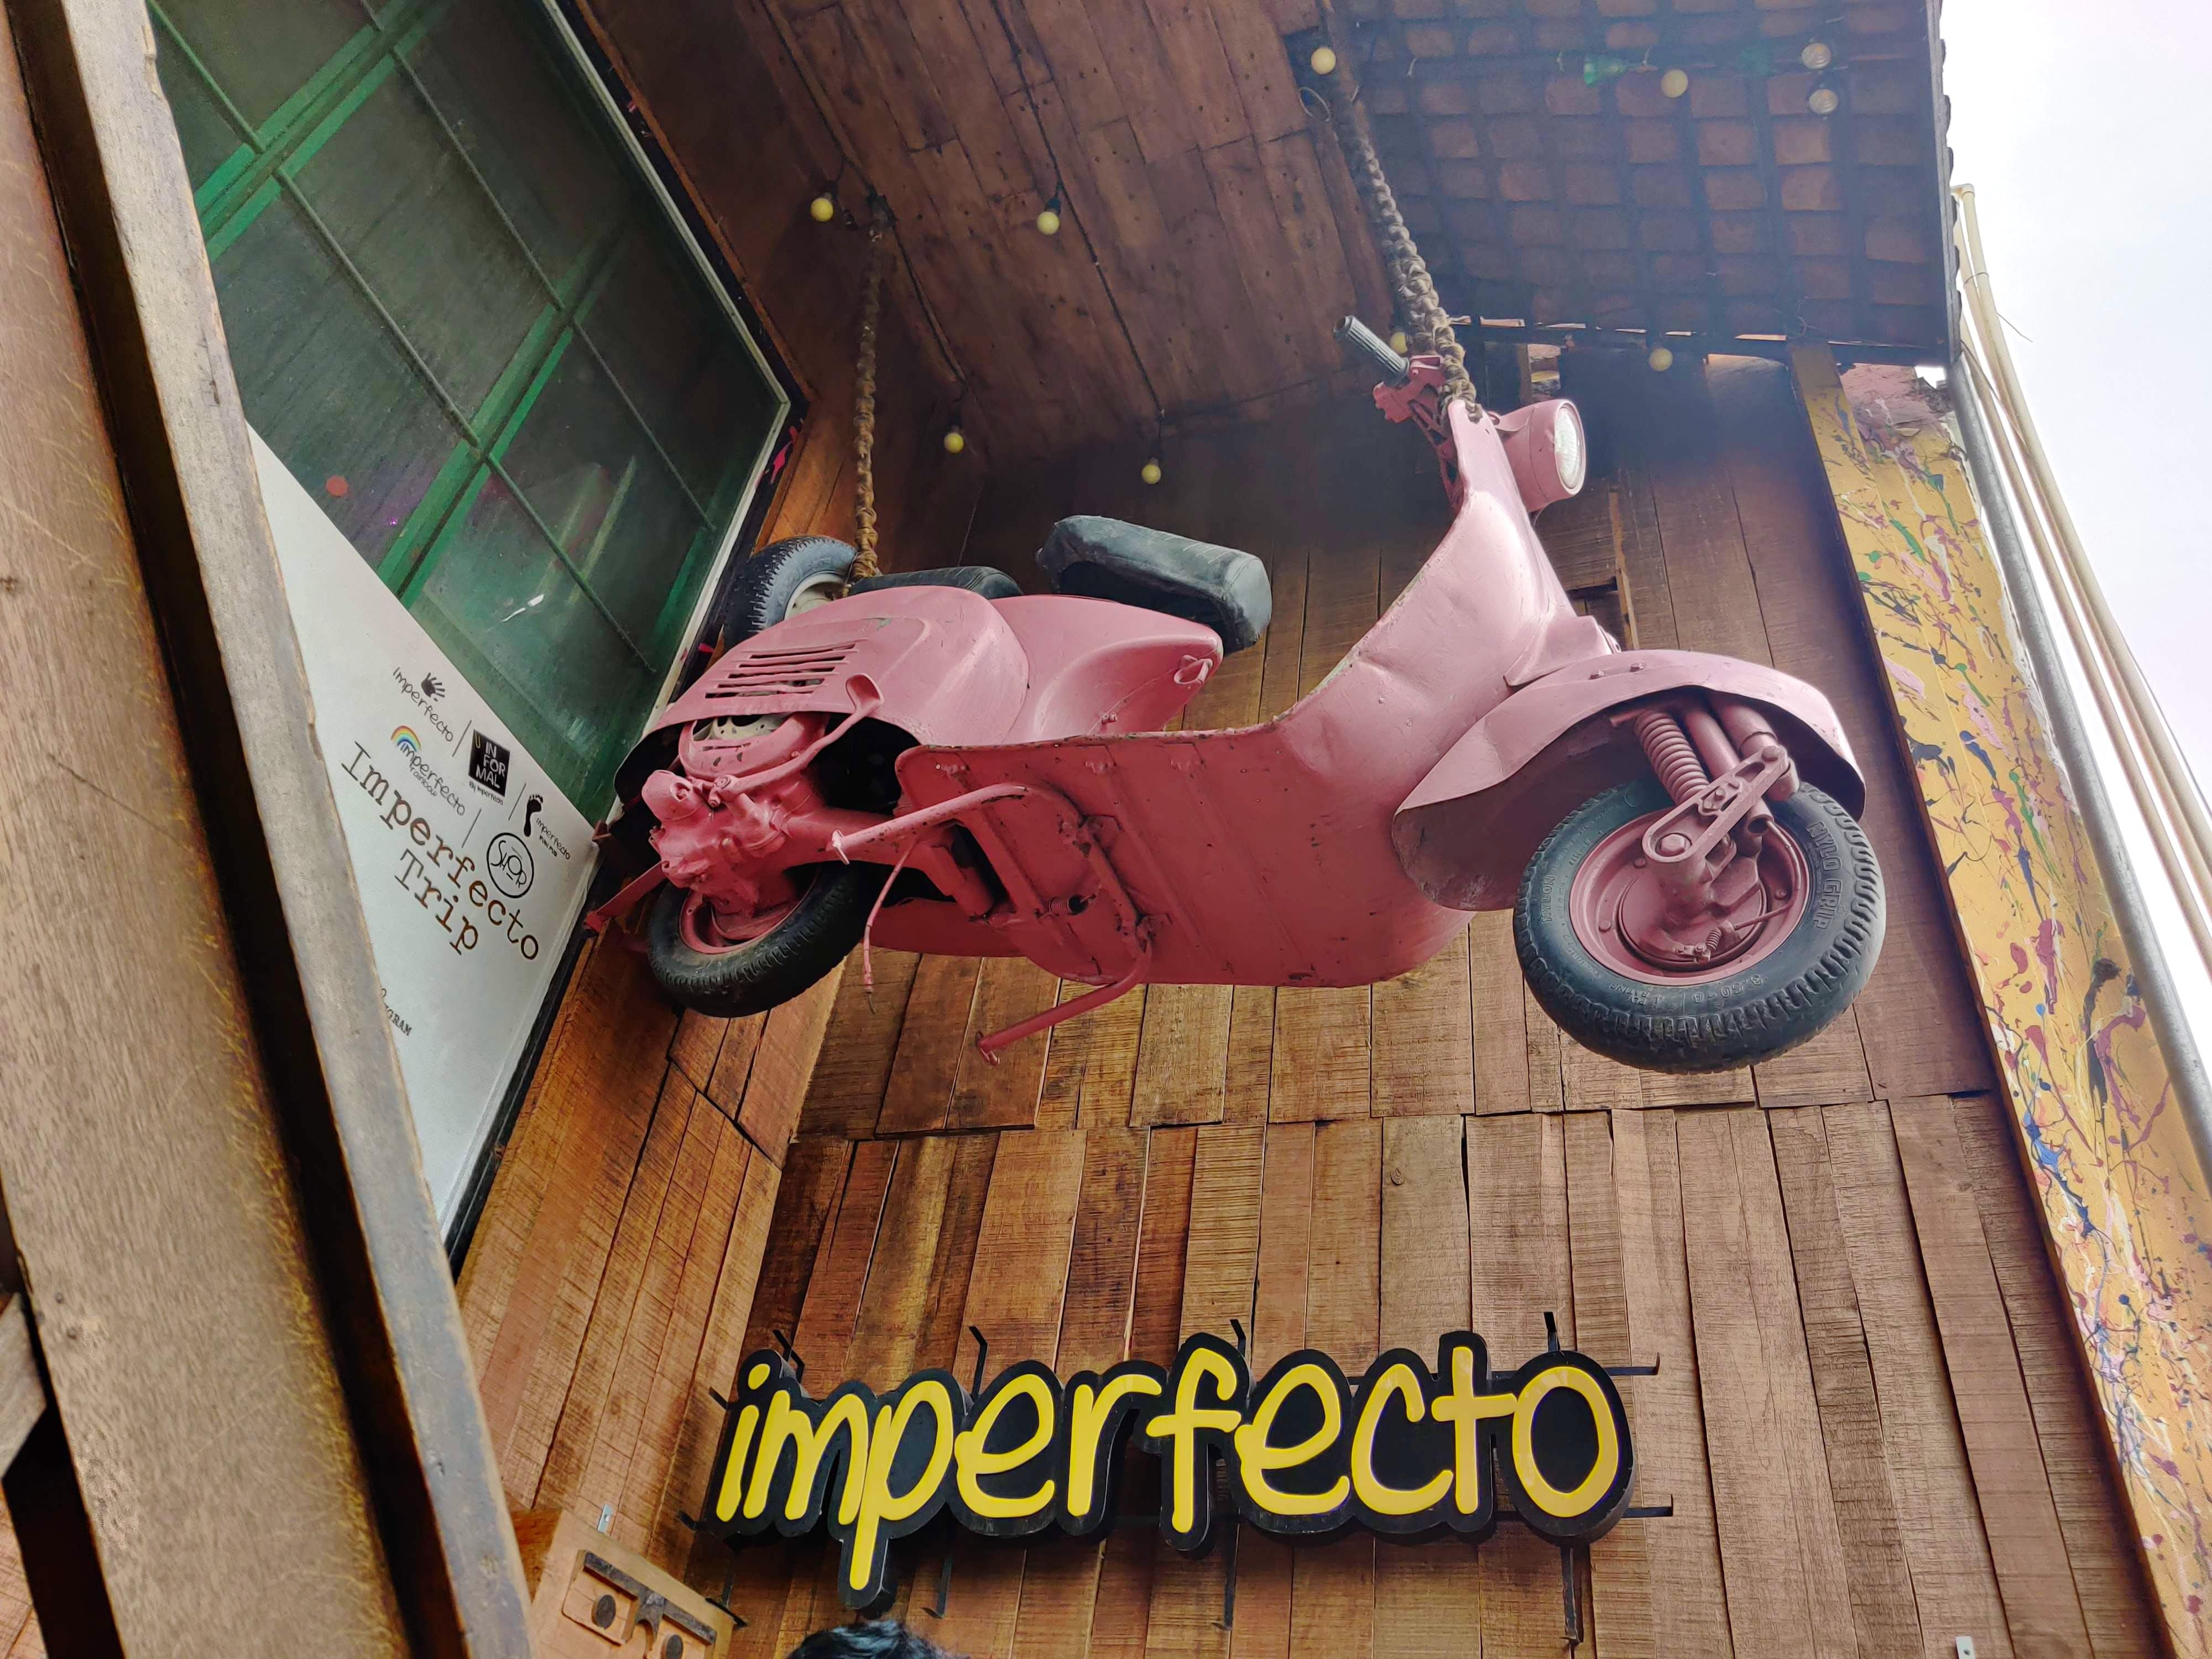 image - Imperfecto